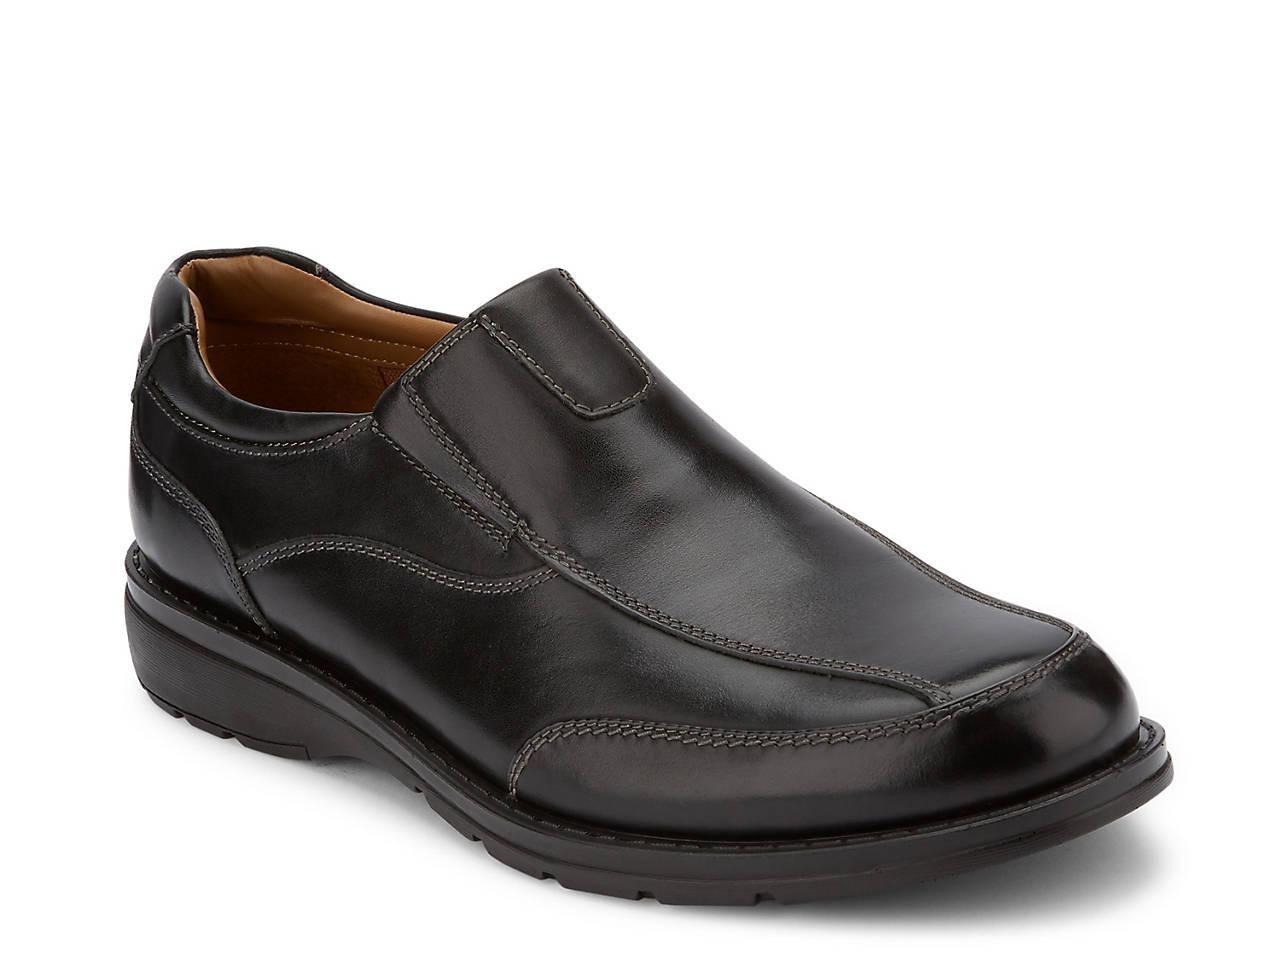 d6143506cf42 Dockers Fontana Slip-On Men s Shoes